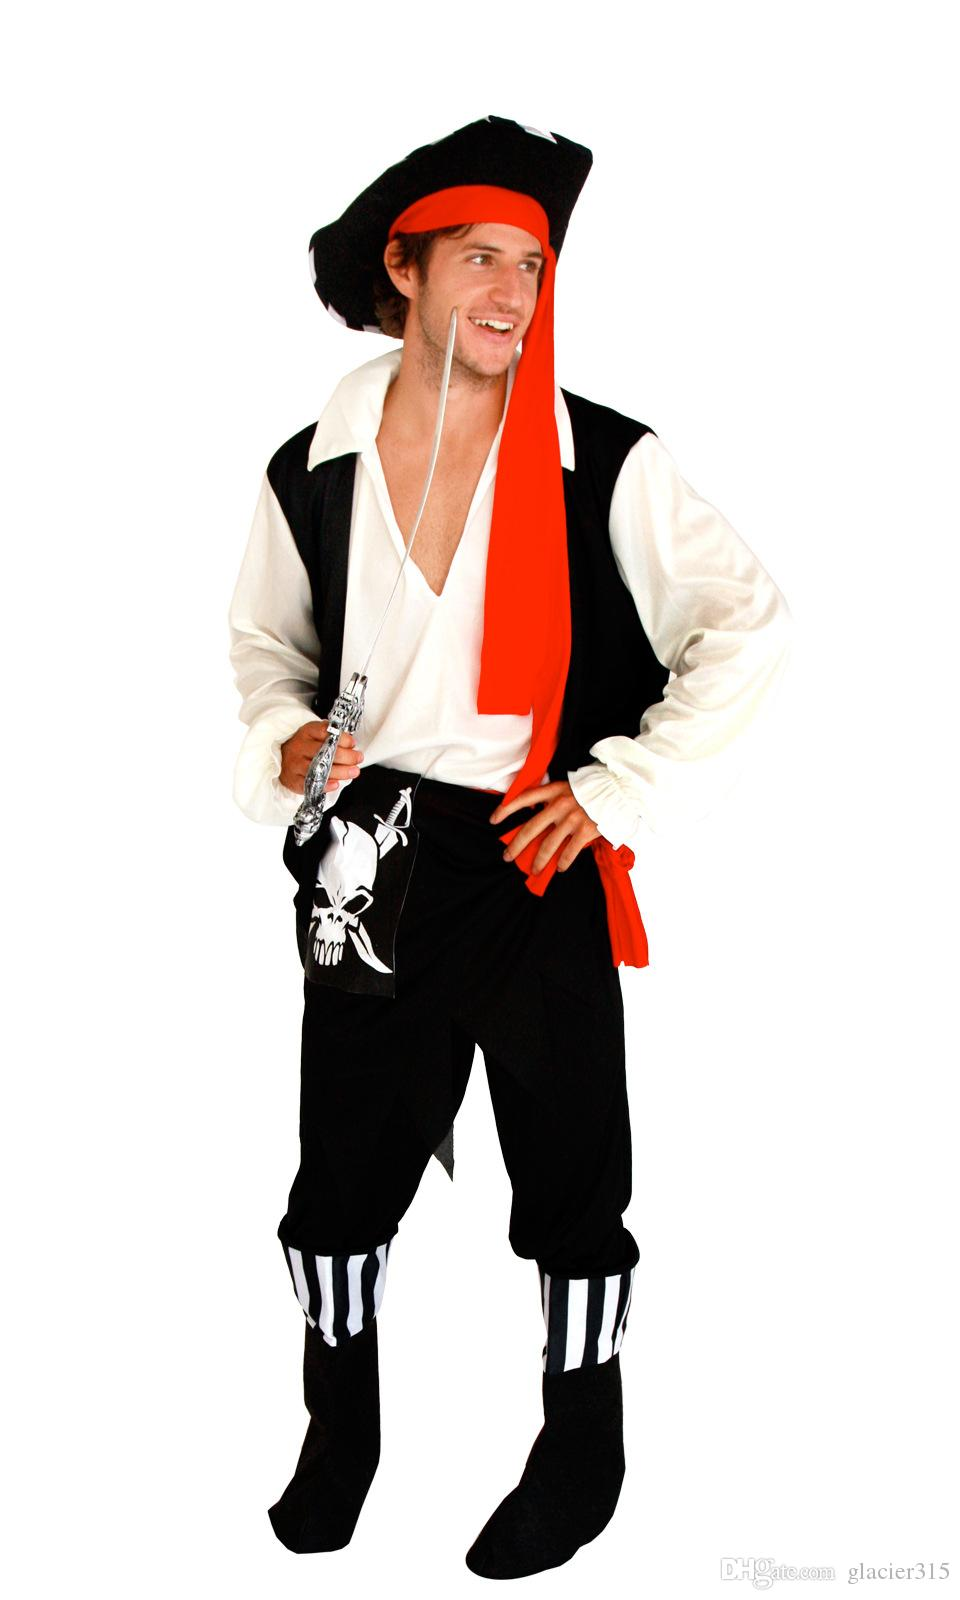 Shanghai Story New Hot Sale Men Caribbean pirate Costume Skeleton Pirate halloween Cosplay adult Cosplay Costume